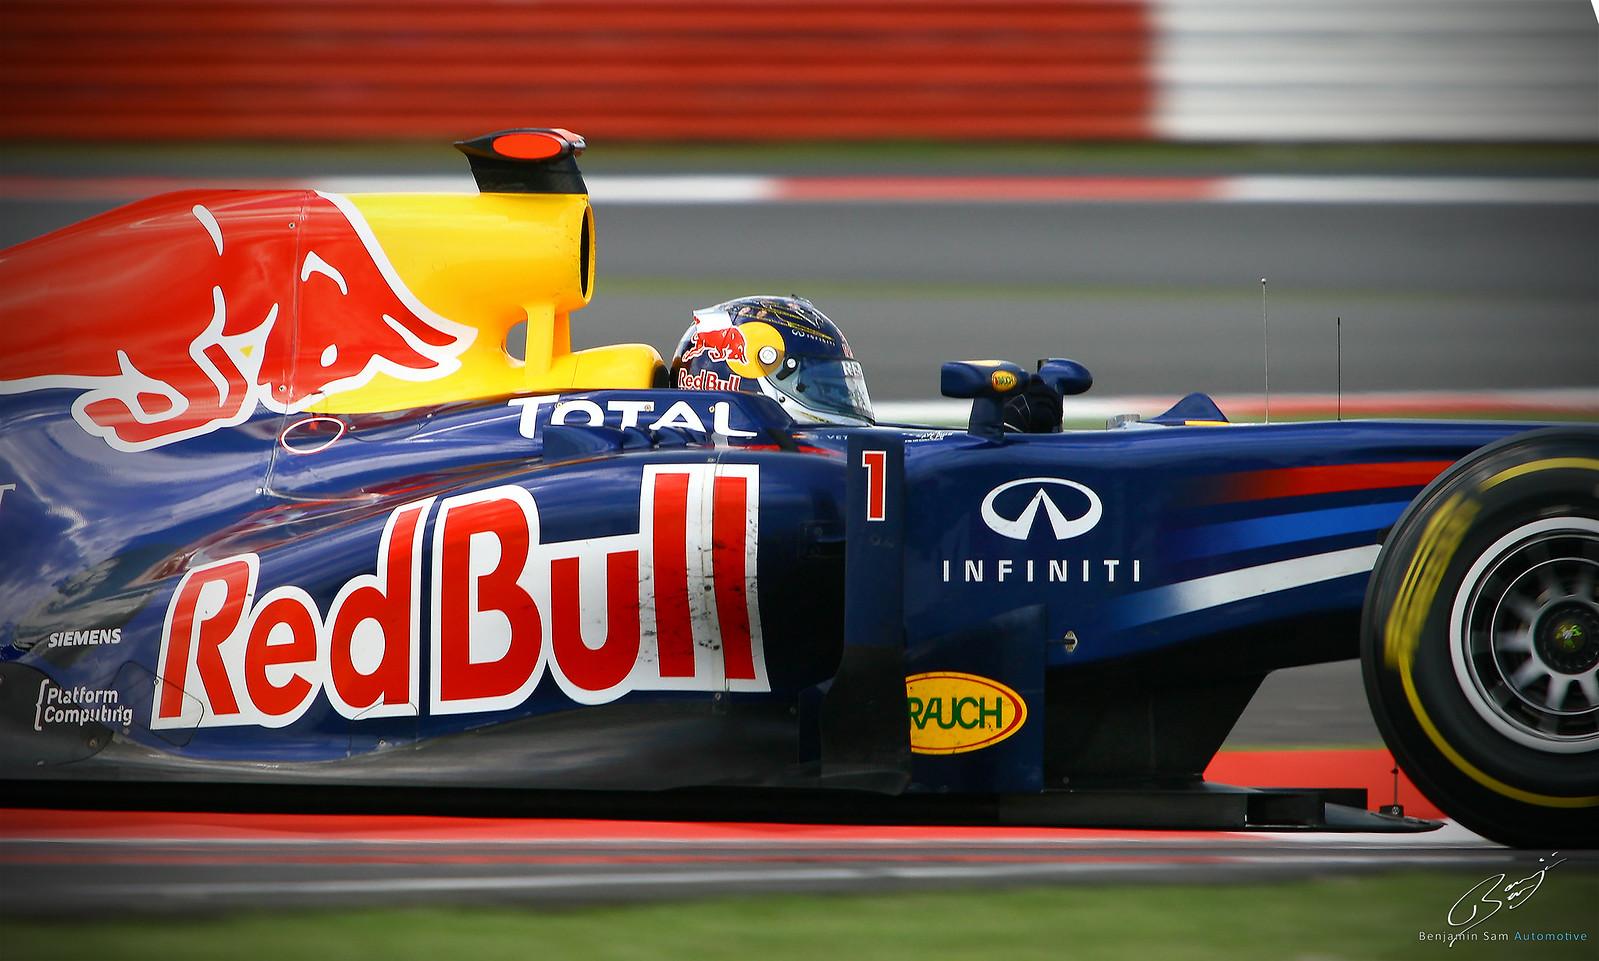 Sebastian Vettel - Redbull - Silverstone 2011